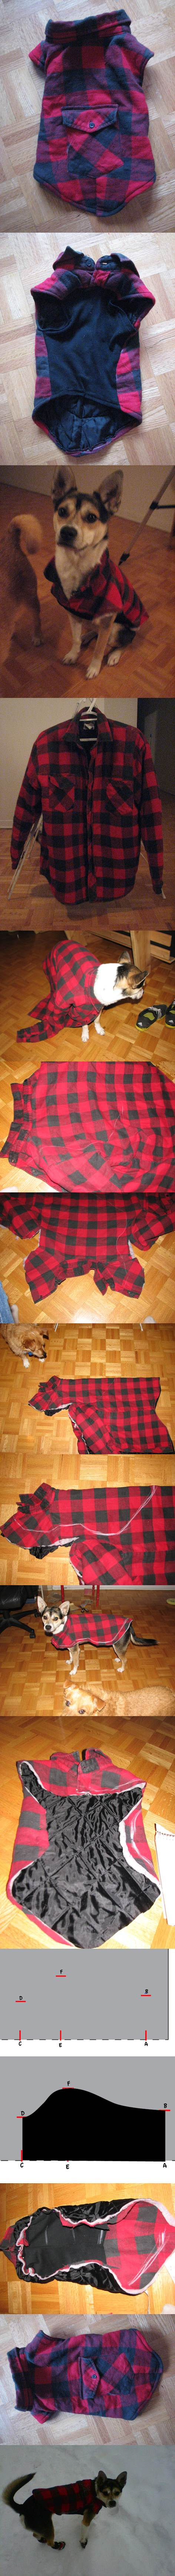 DIY Dog Winter Jacket from Old Shirt 2